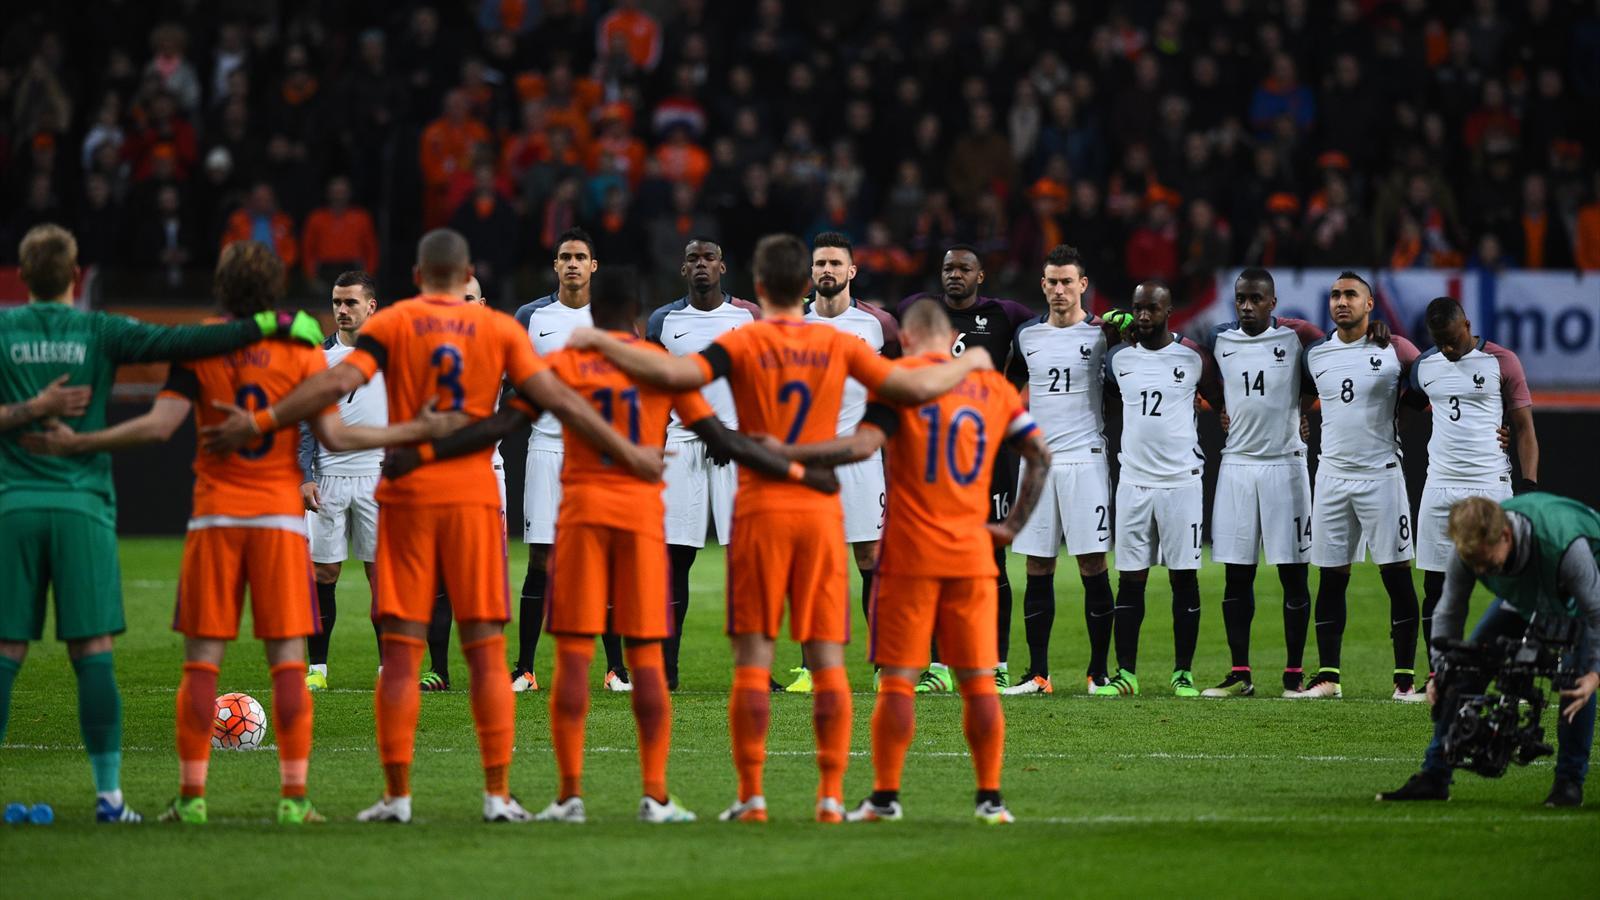 ... LIVE. Pays-Bas - France - Matches amicaux - 25 mars 2016 - Eurosport